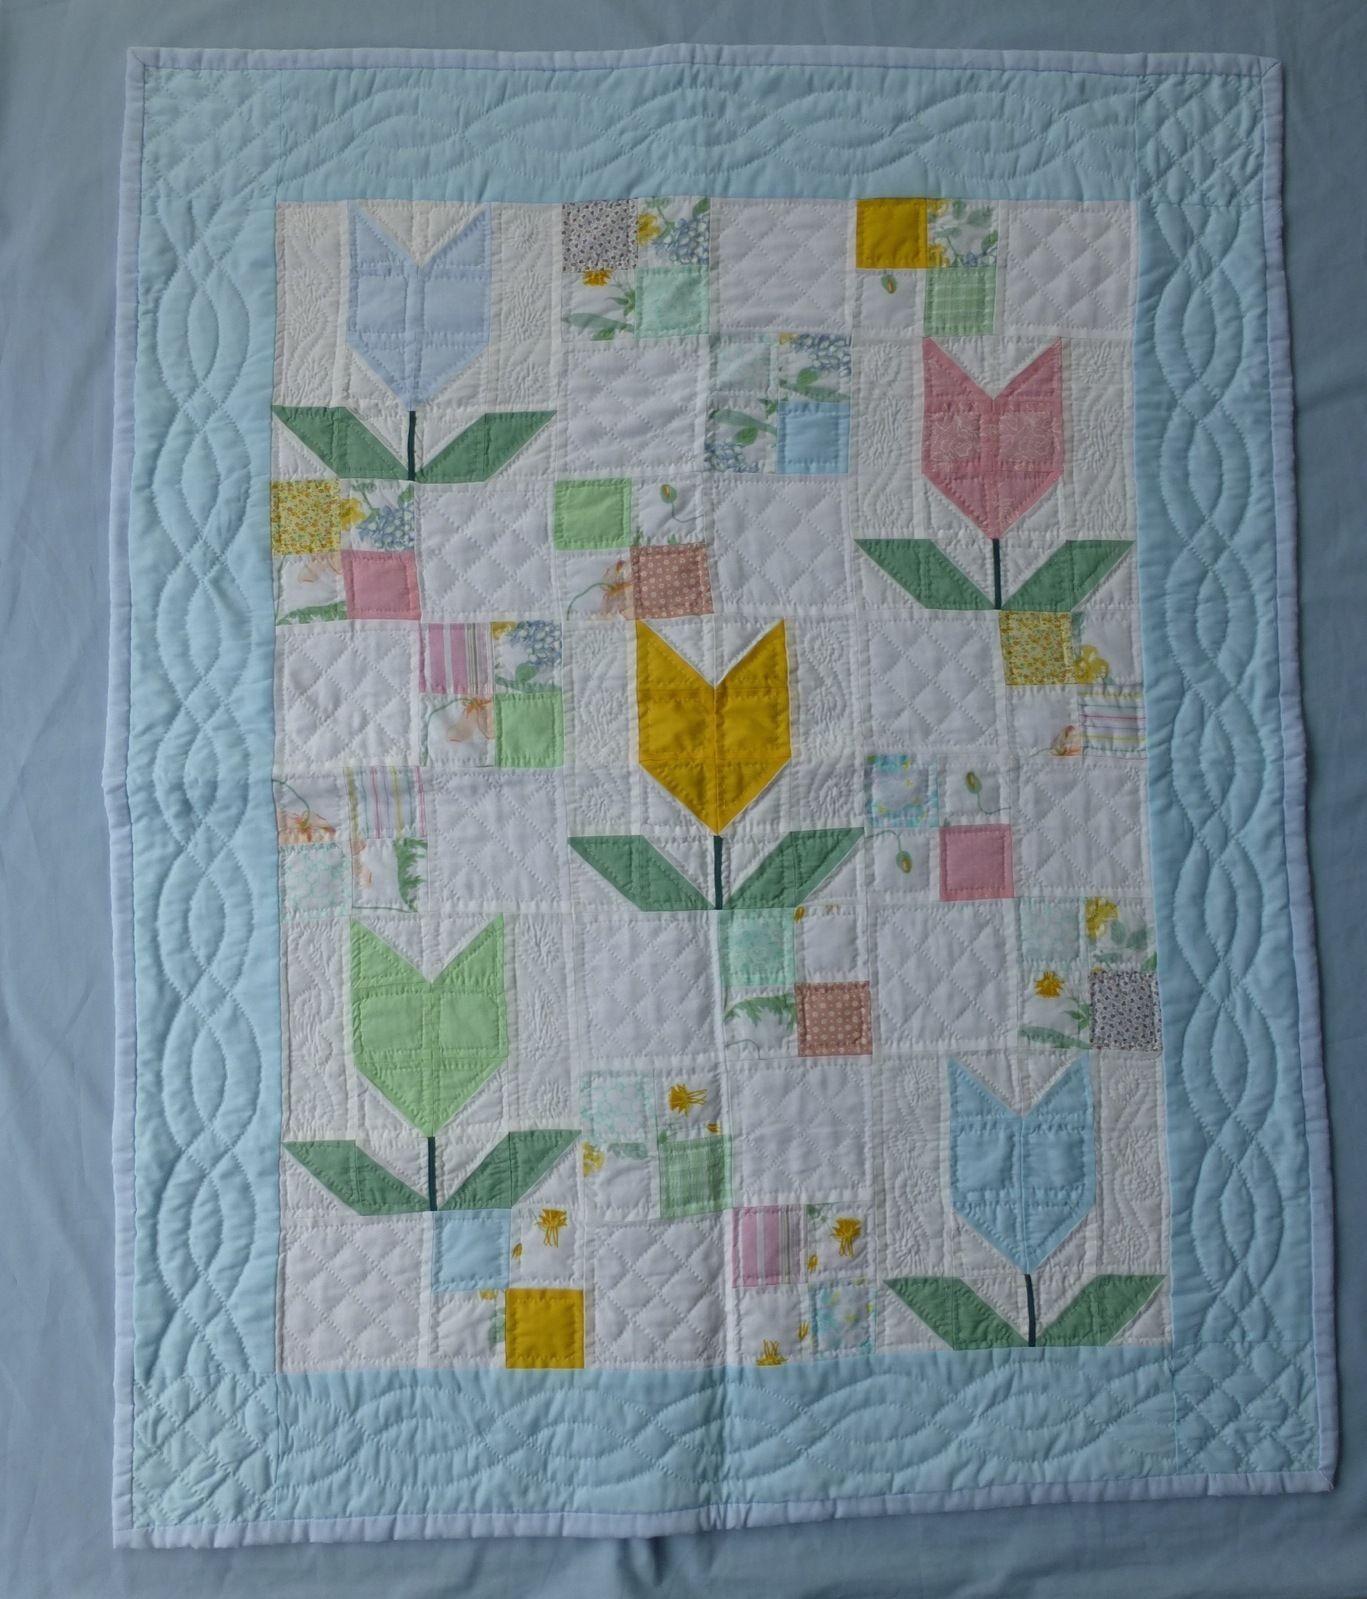 Vintage hand stitched cotton small patchwork quilt child cot crib 90x110cm | eBay